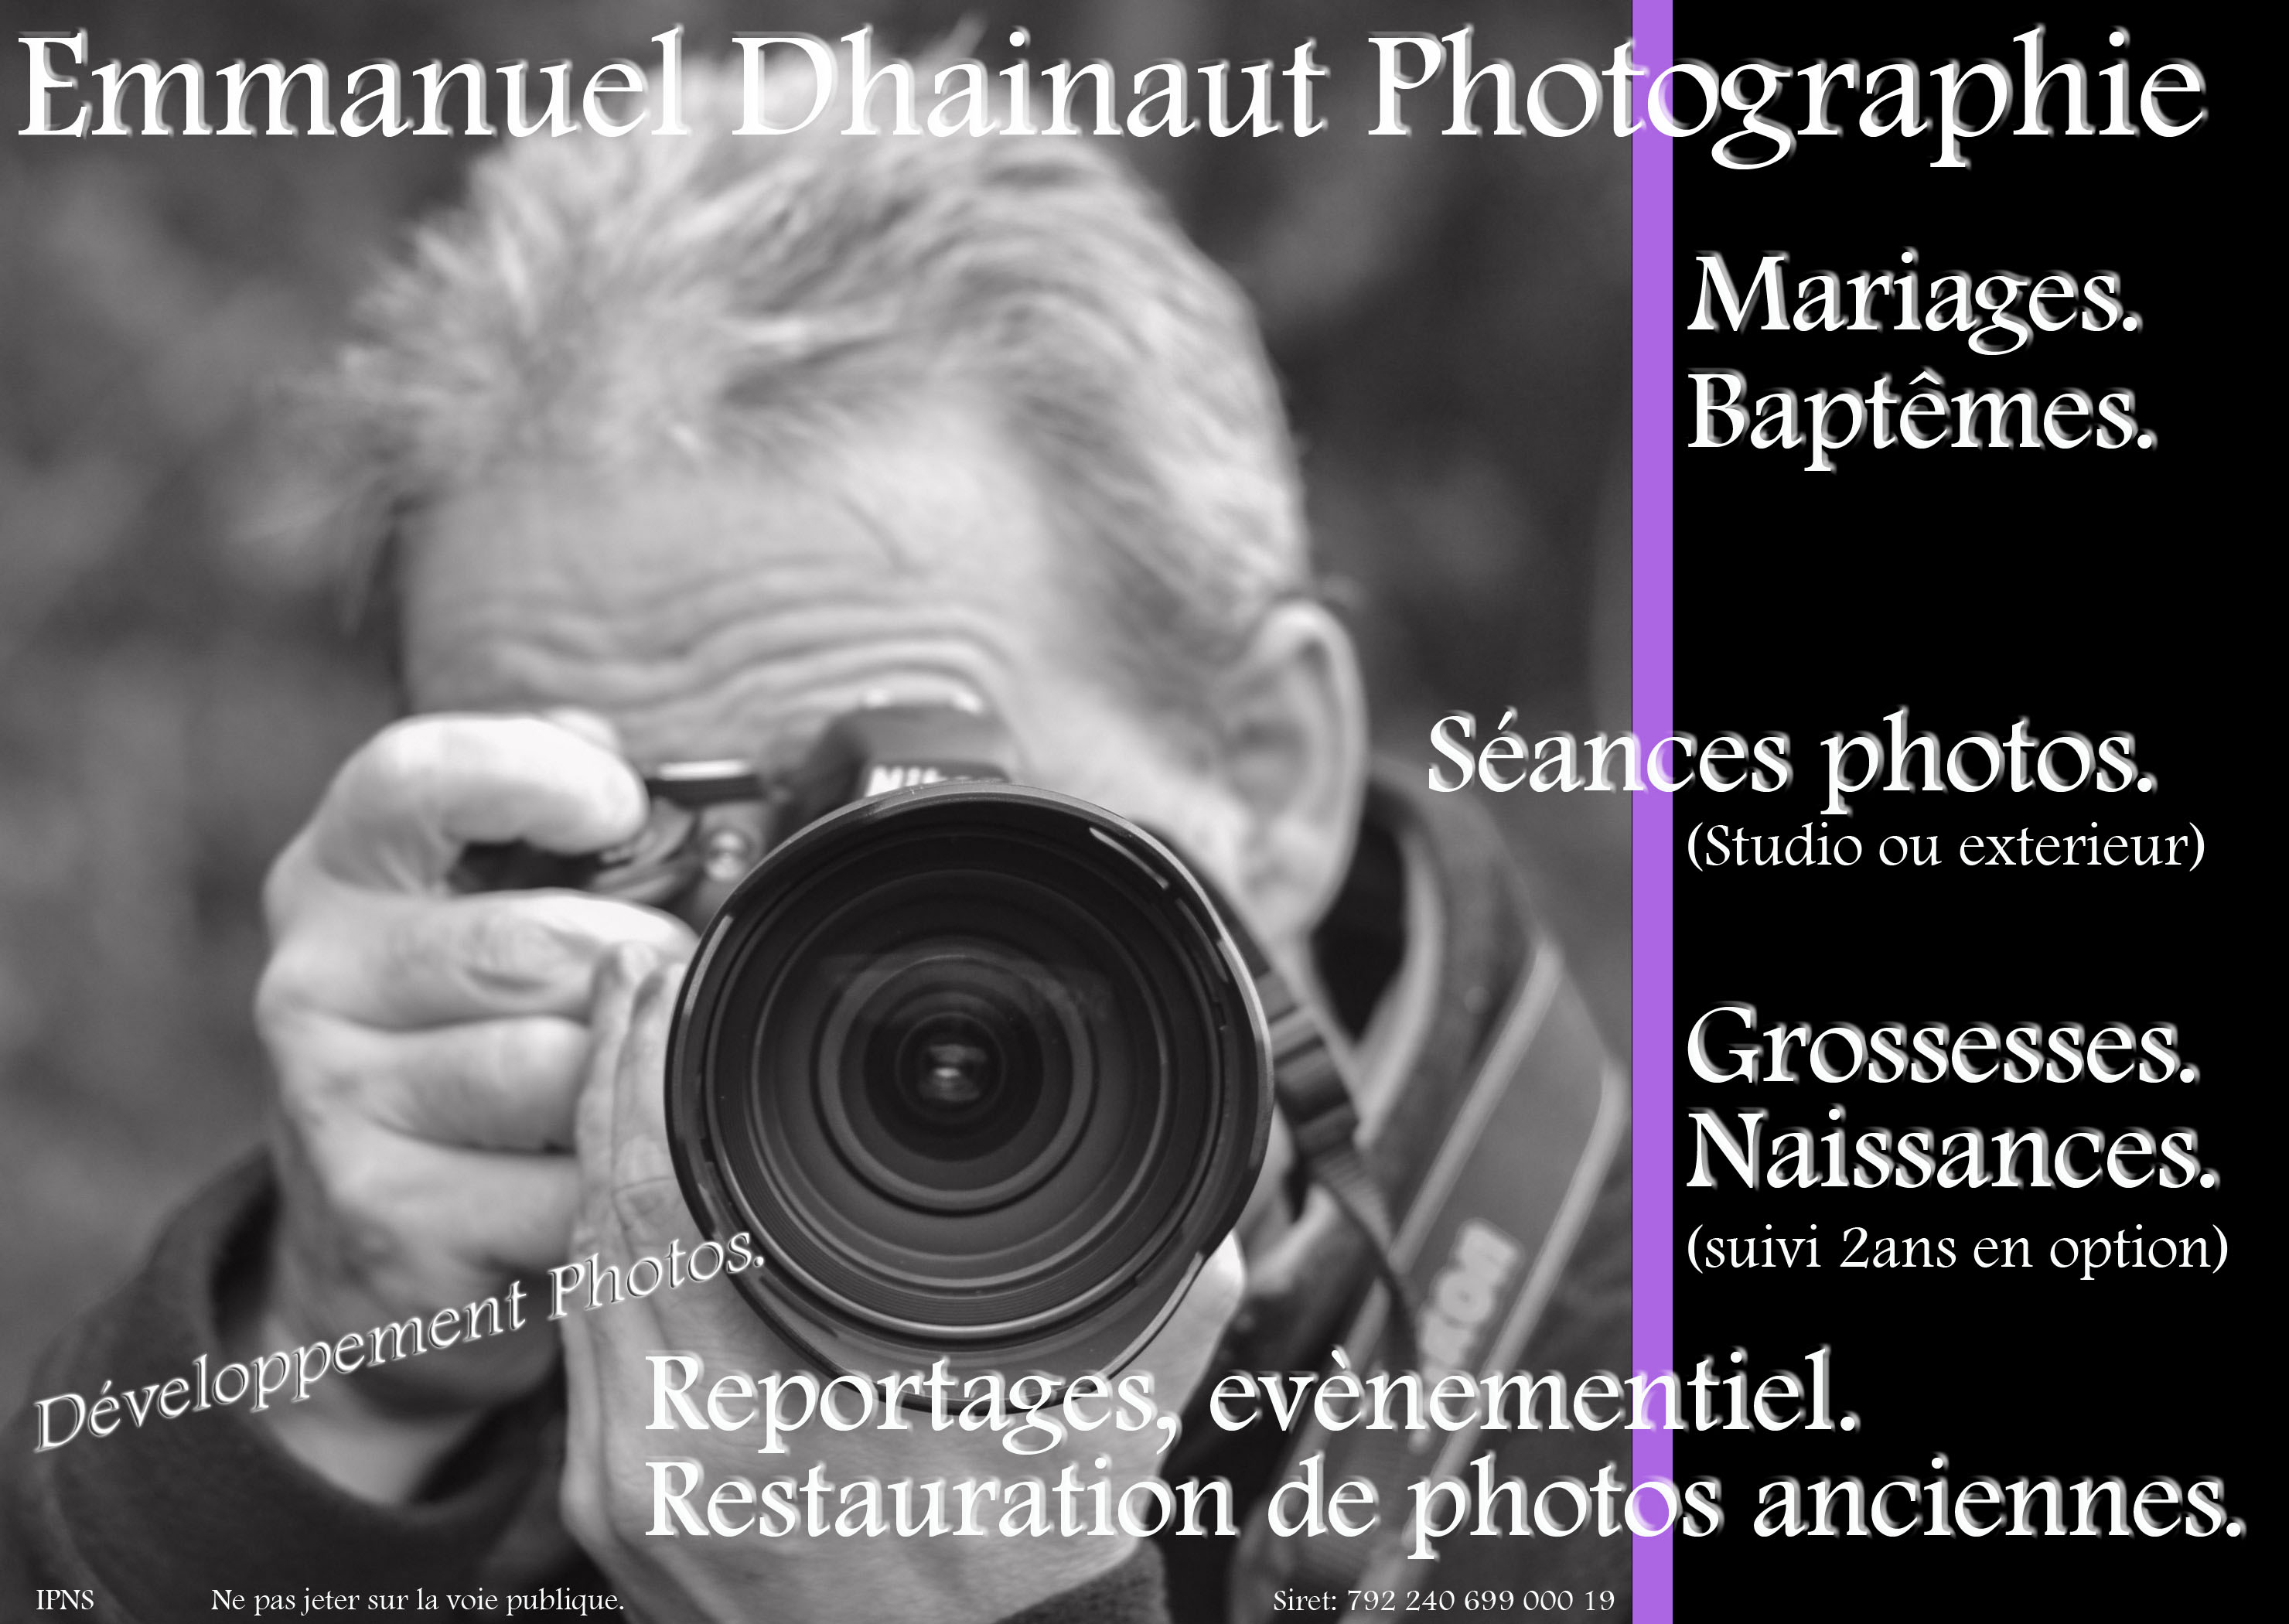 Emmanueldhainautphotographie